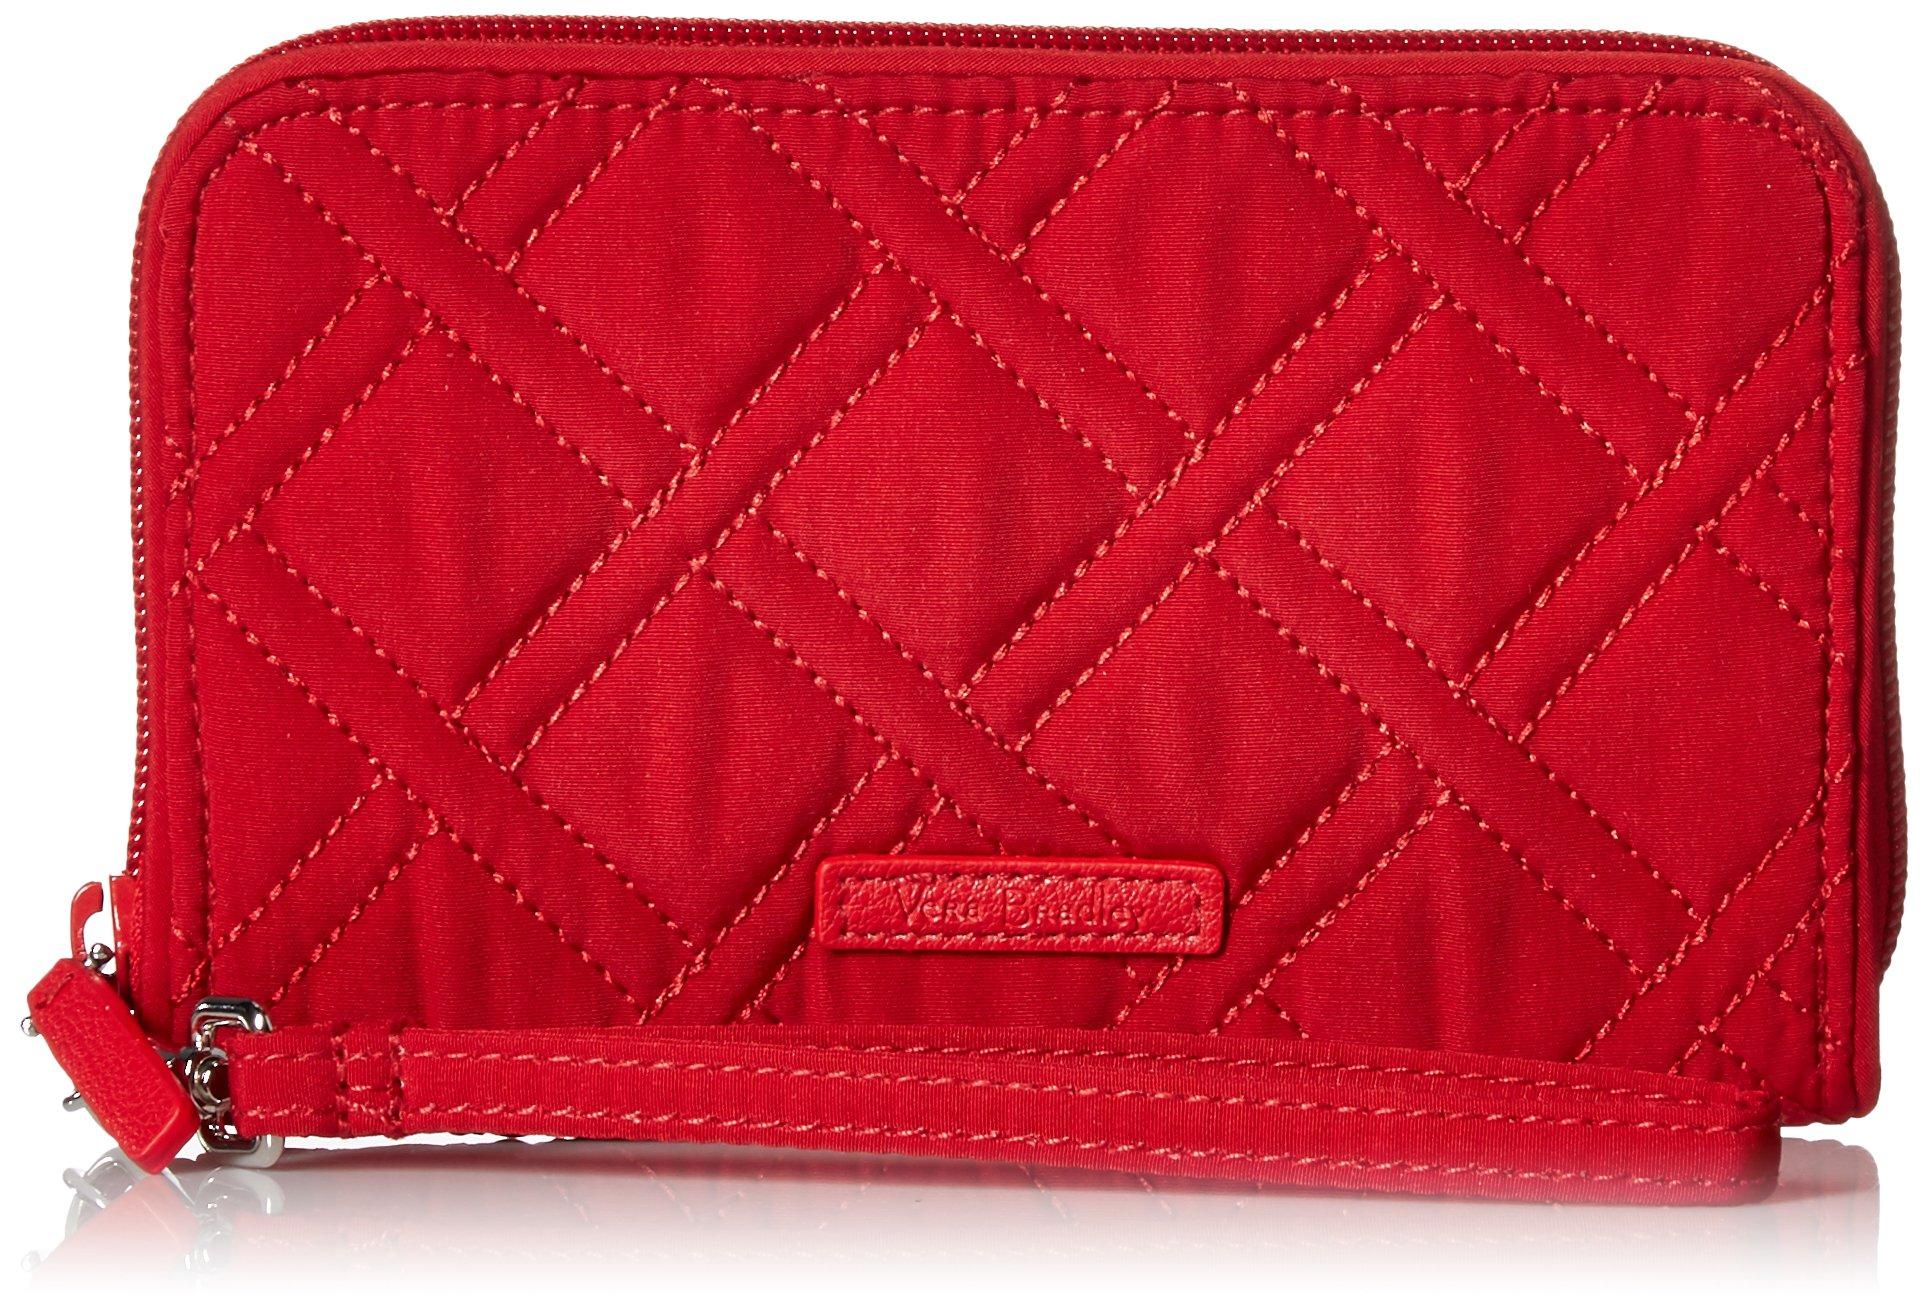 Vera Bradley RFID Grab and Go Wristlet, Cardinal red